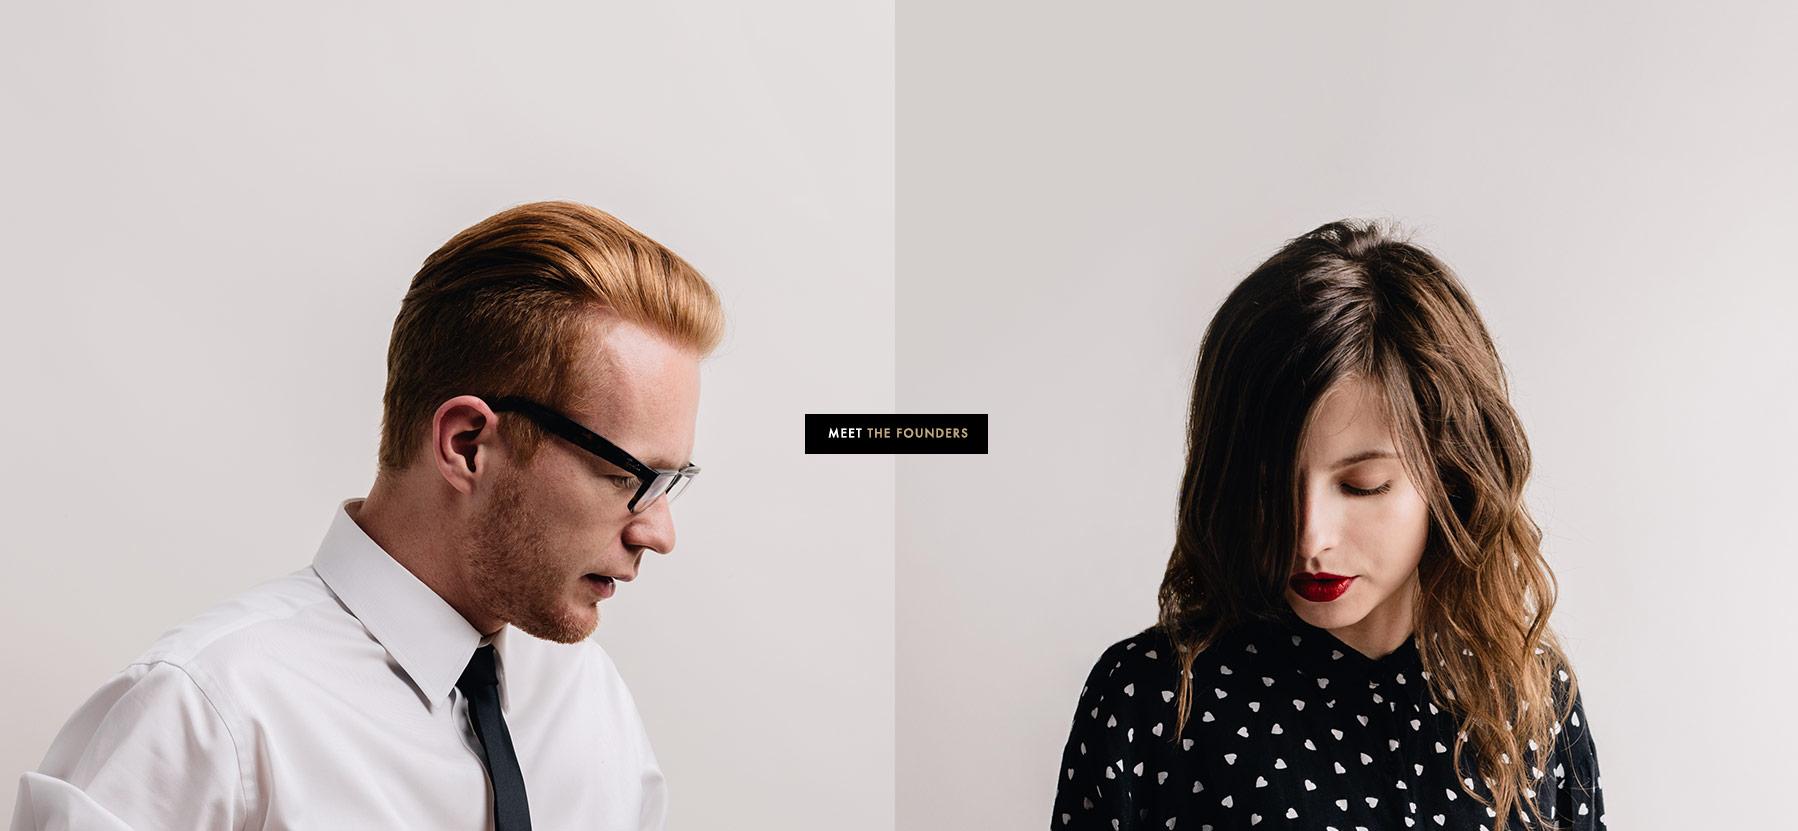 amofw-founders-02